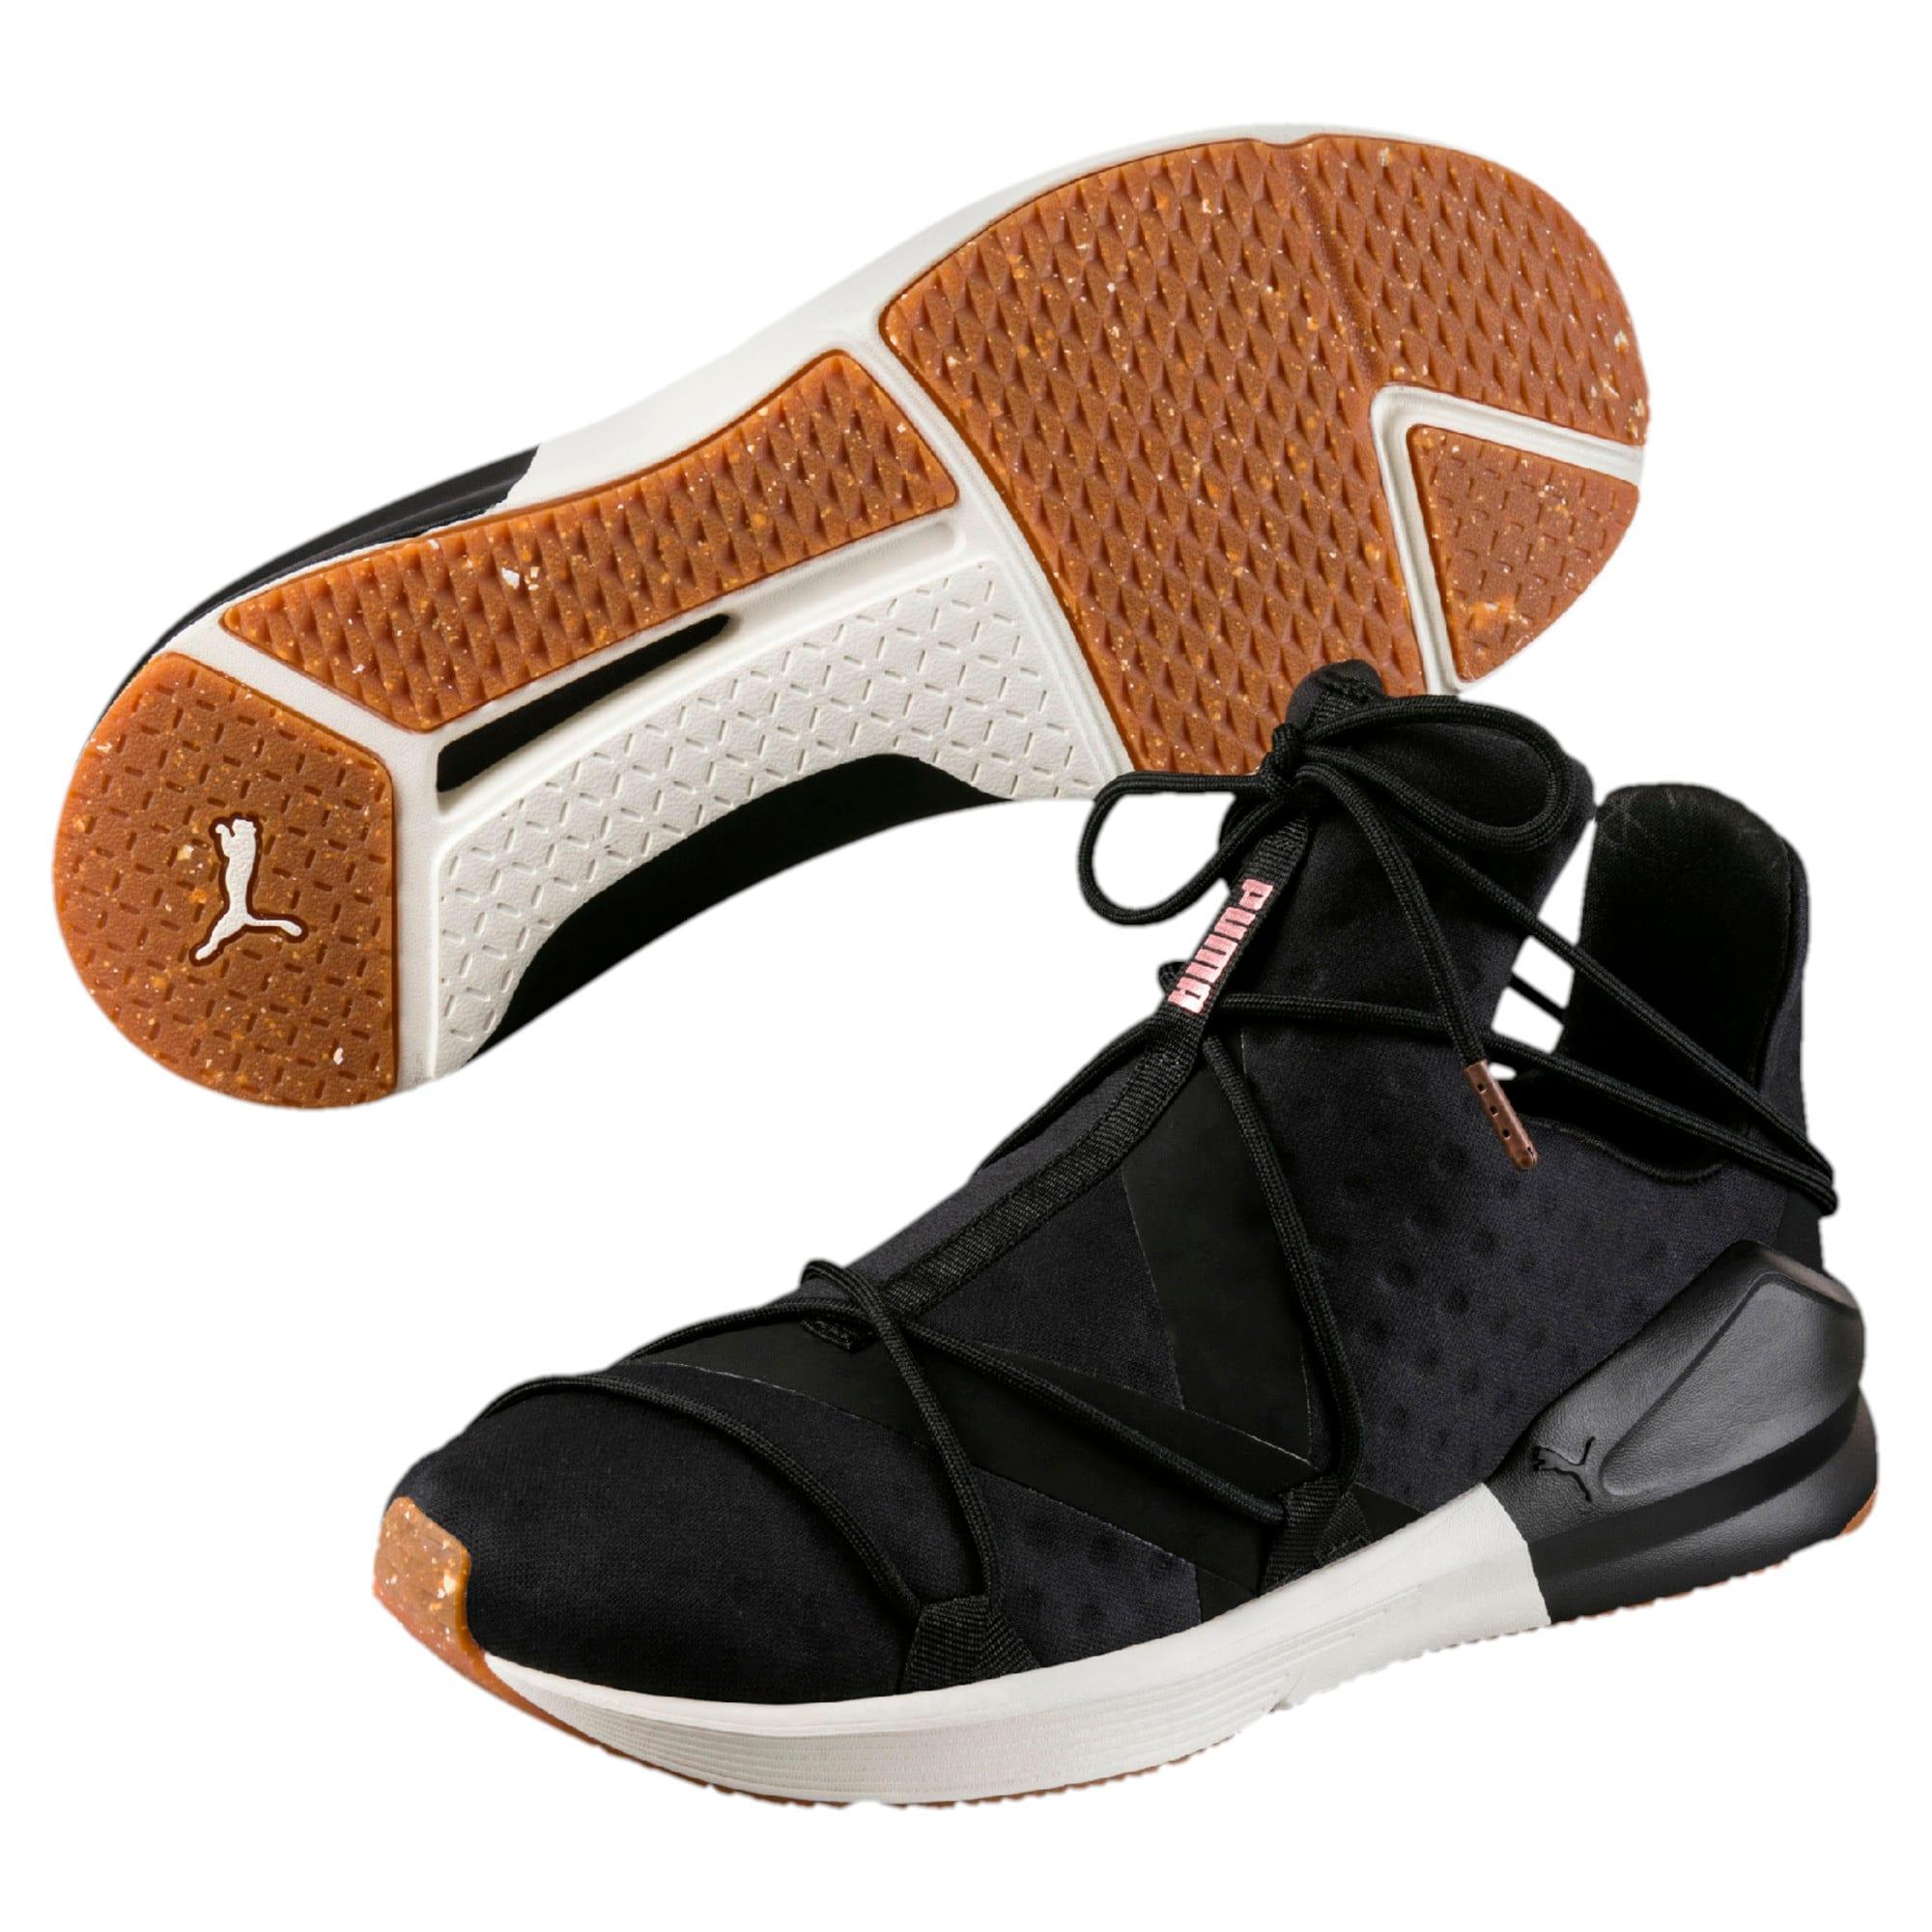 Thumbnail 6 of Fierce Rope VR Women's Training Shoes, Puma Black-Whisper White, medium-IND